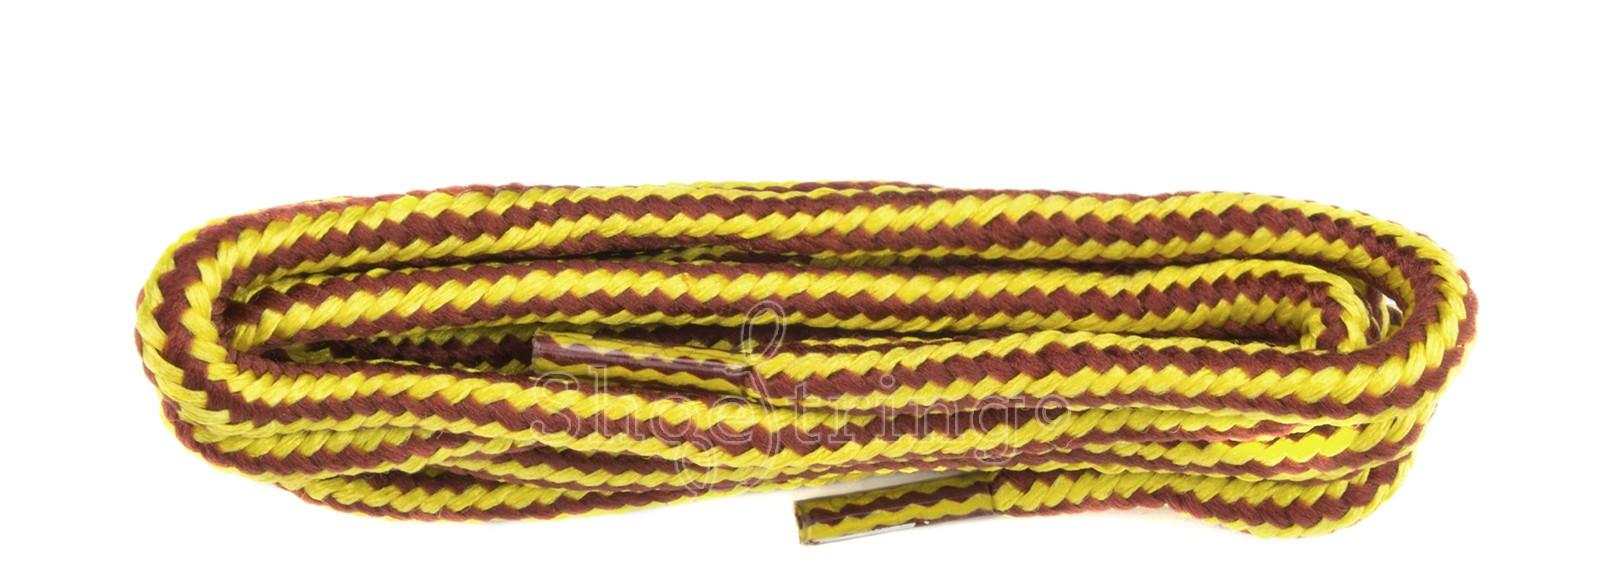 Kicker Light Laces